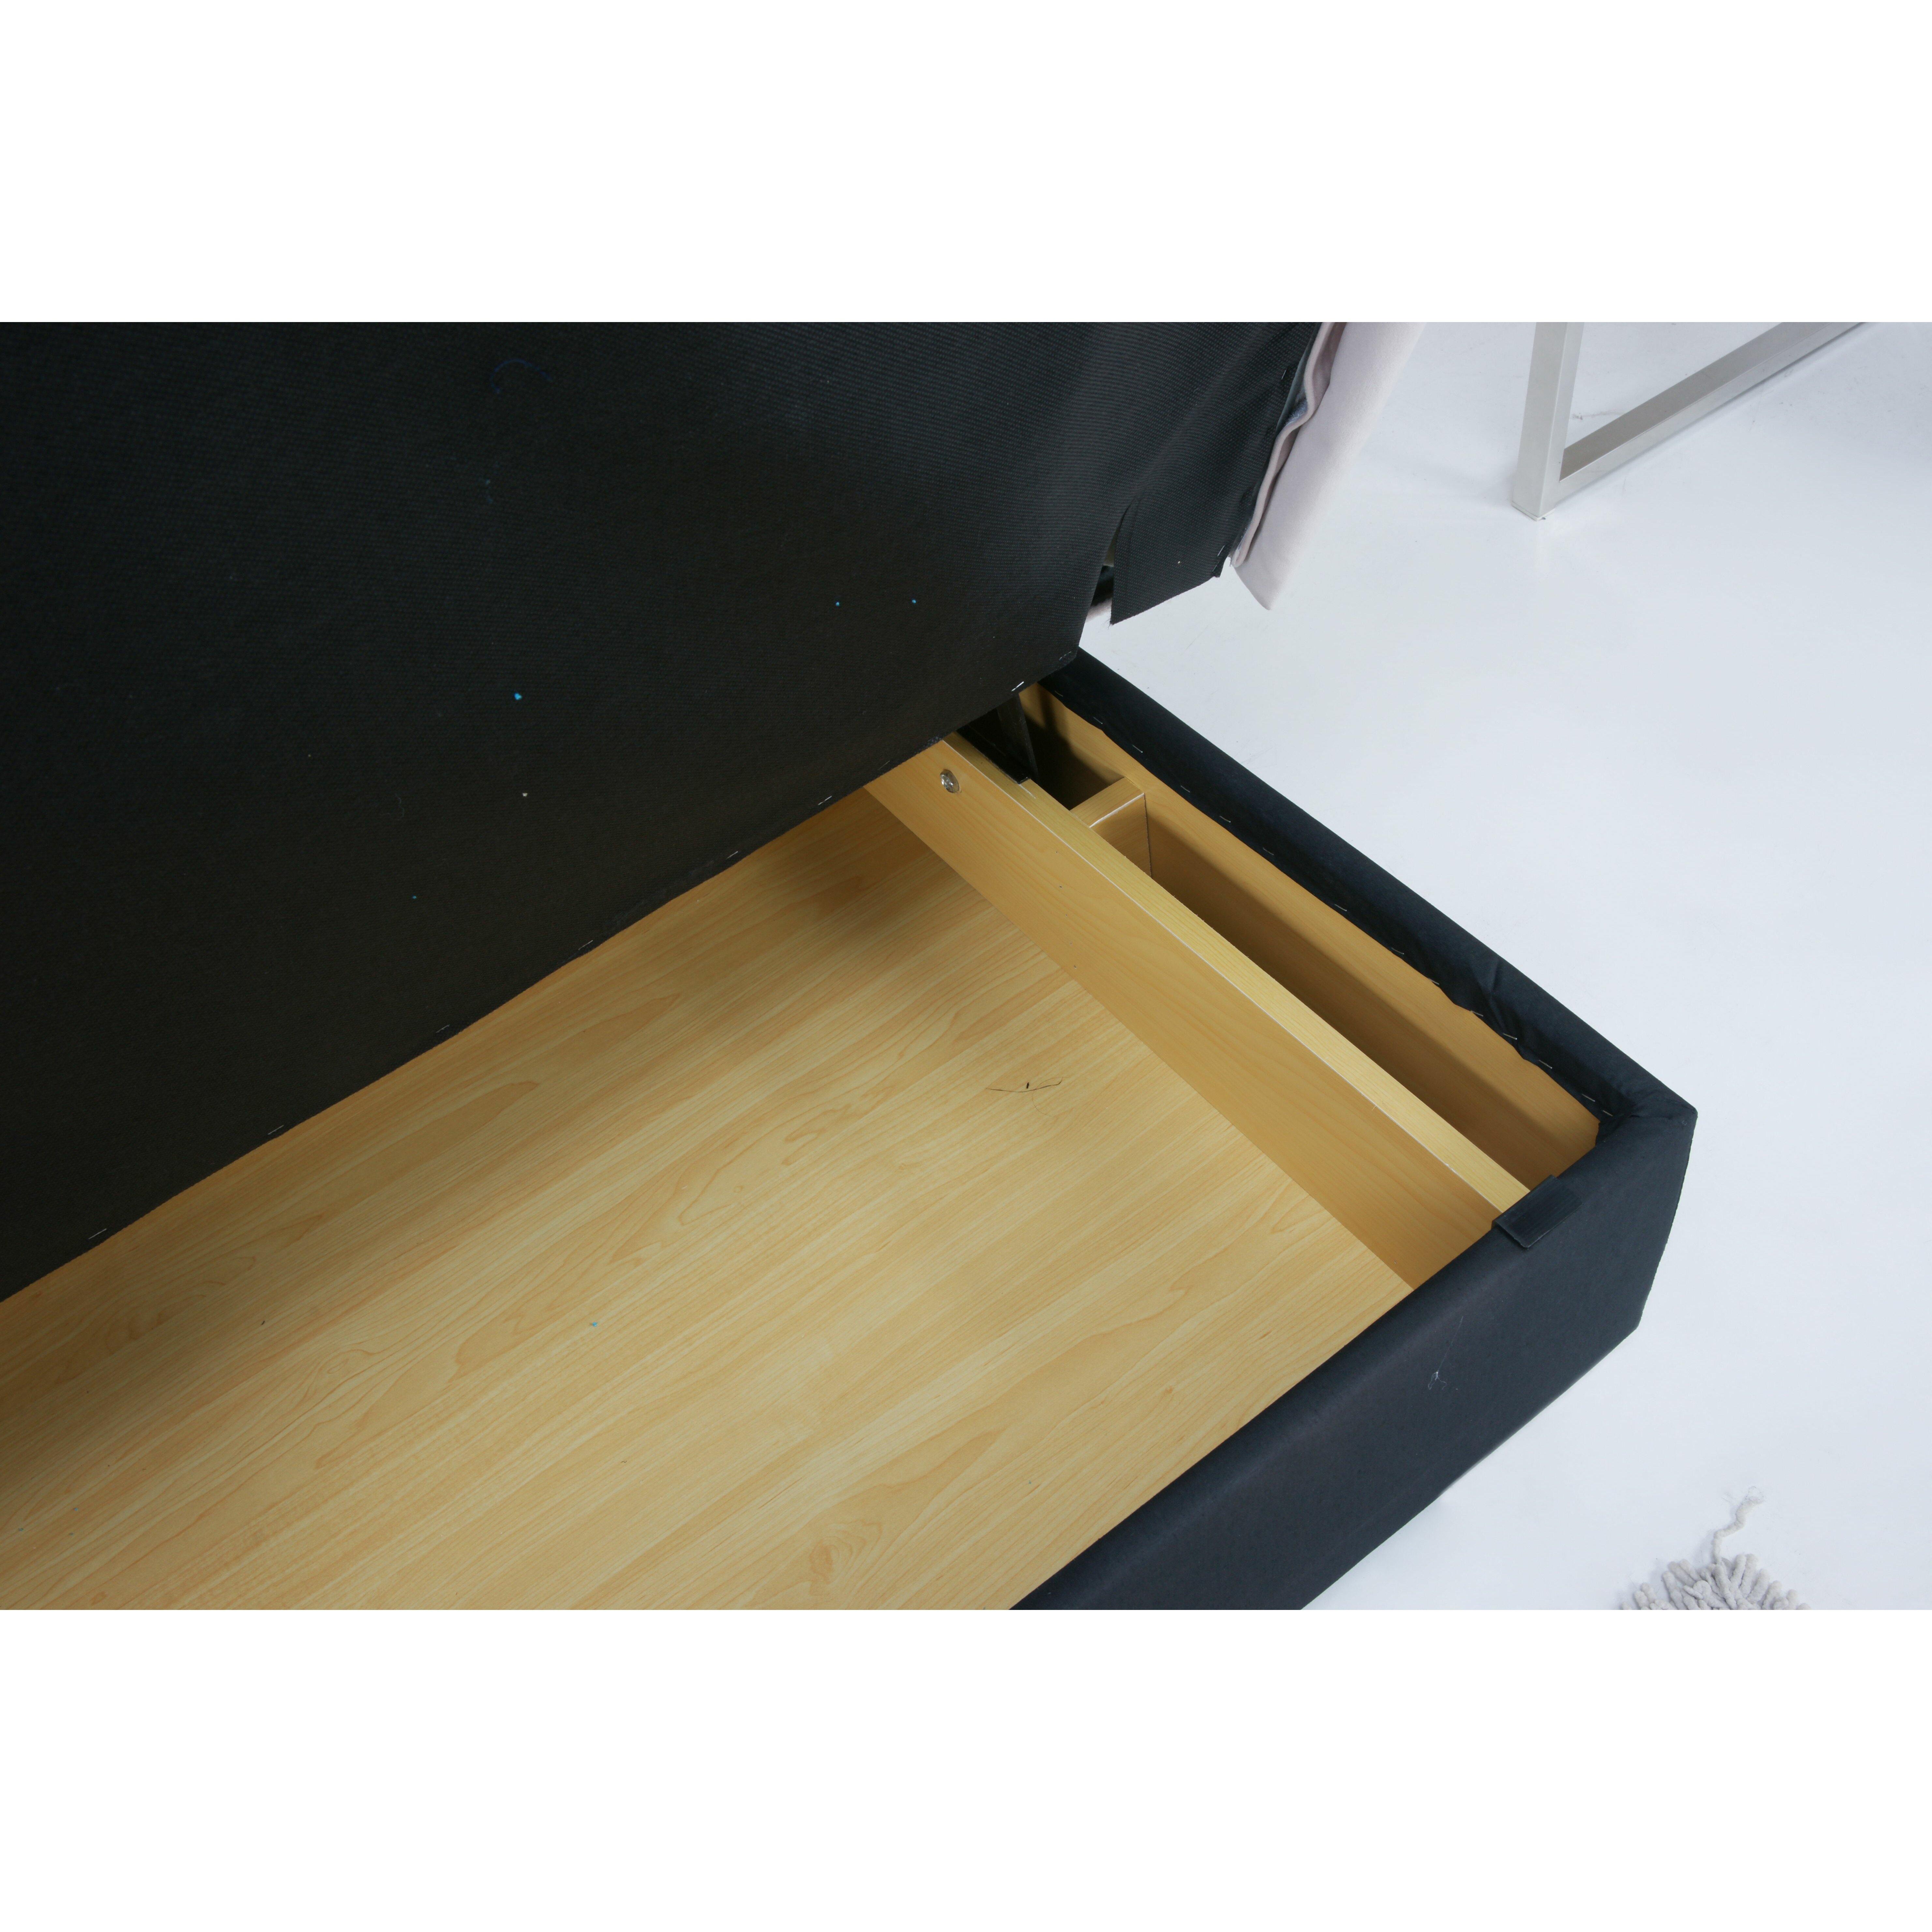 yoko 3 seater clic clac sofa bed wayfair uk. Black Bedroom Furniture Sets. Home Design Ideas